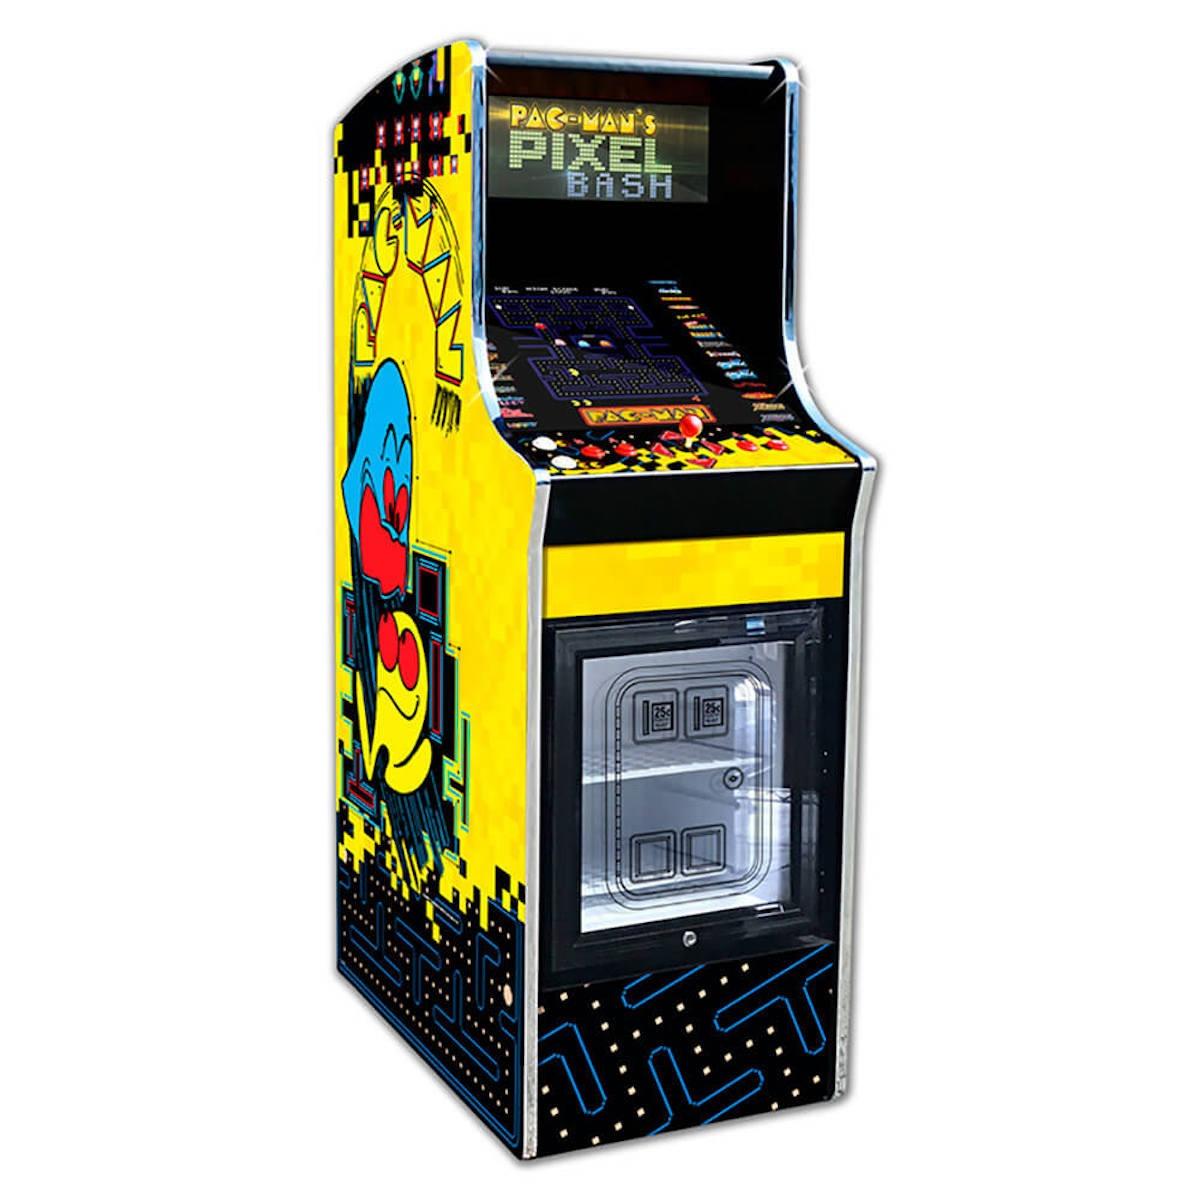 pac man pixel bash chill arcade - Rentals